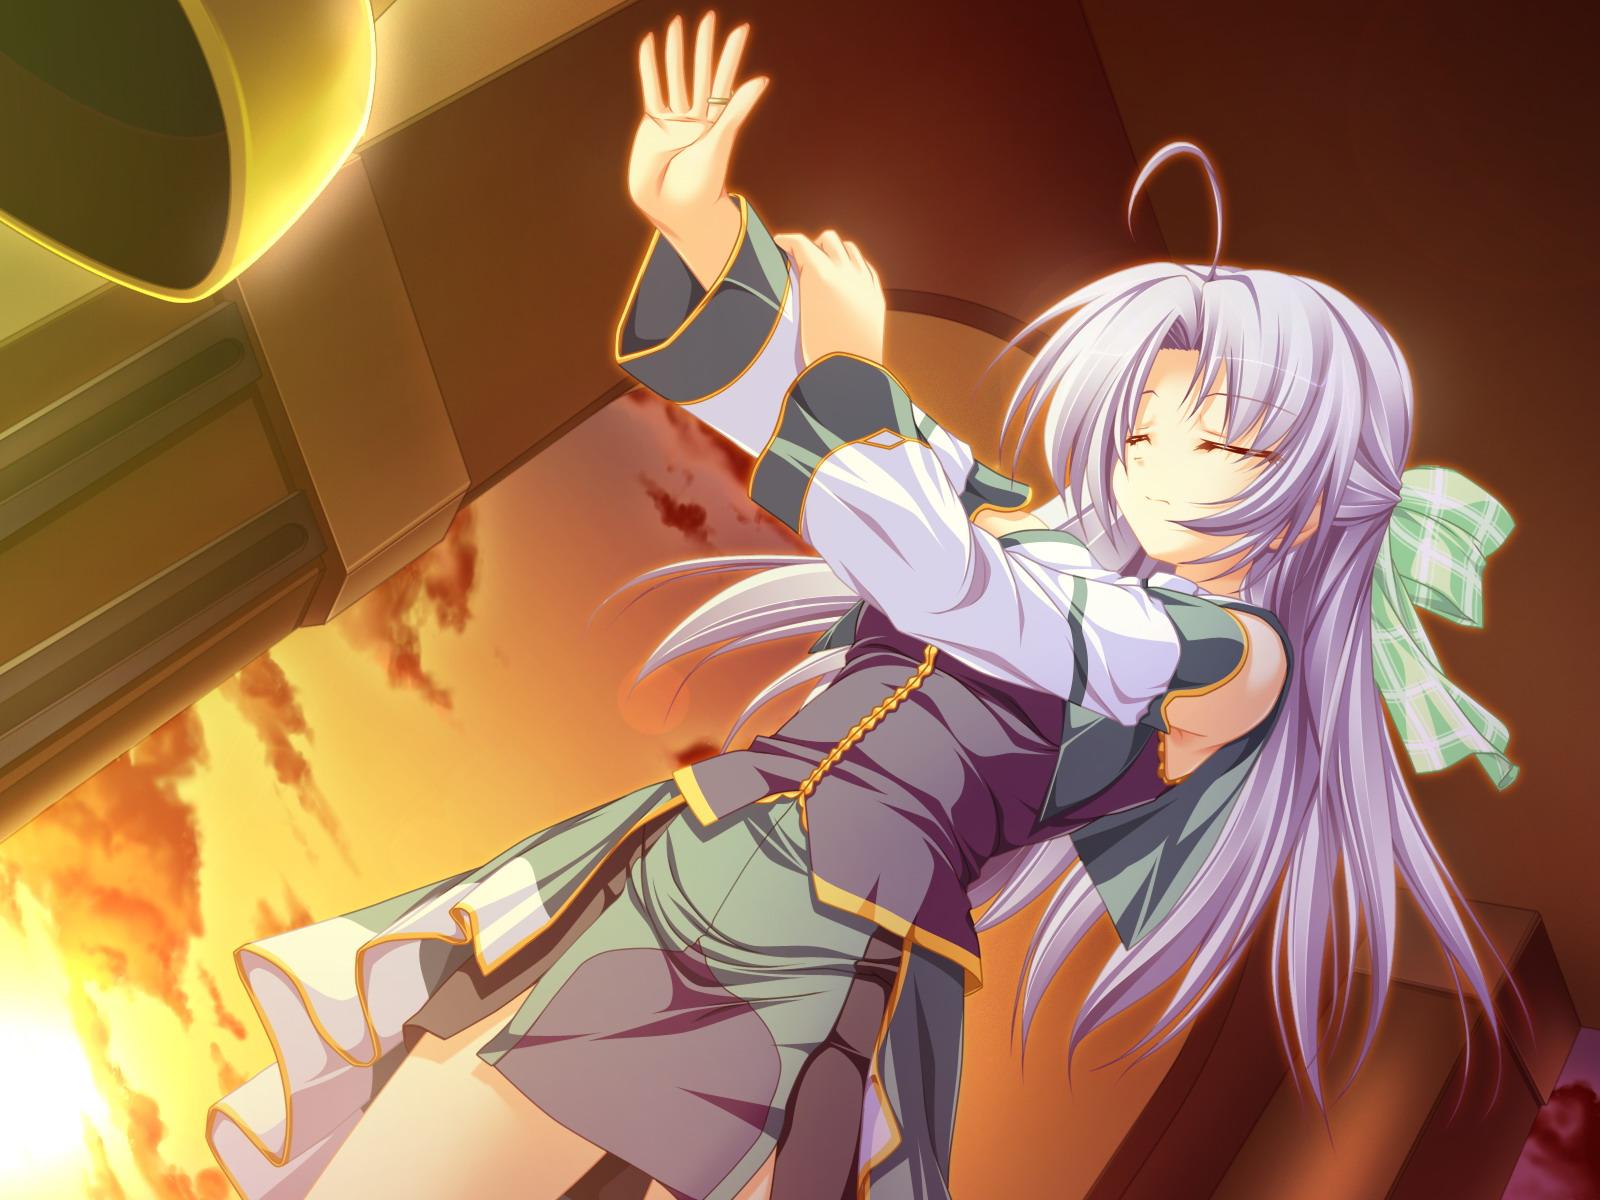 alicia_infans bow game_cg long_hair magus_tale purple_hair tenmaso whirlpool